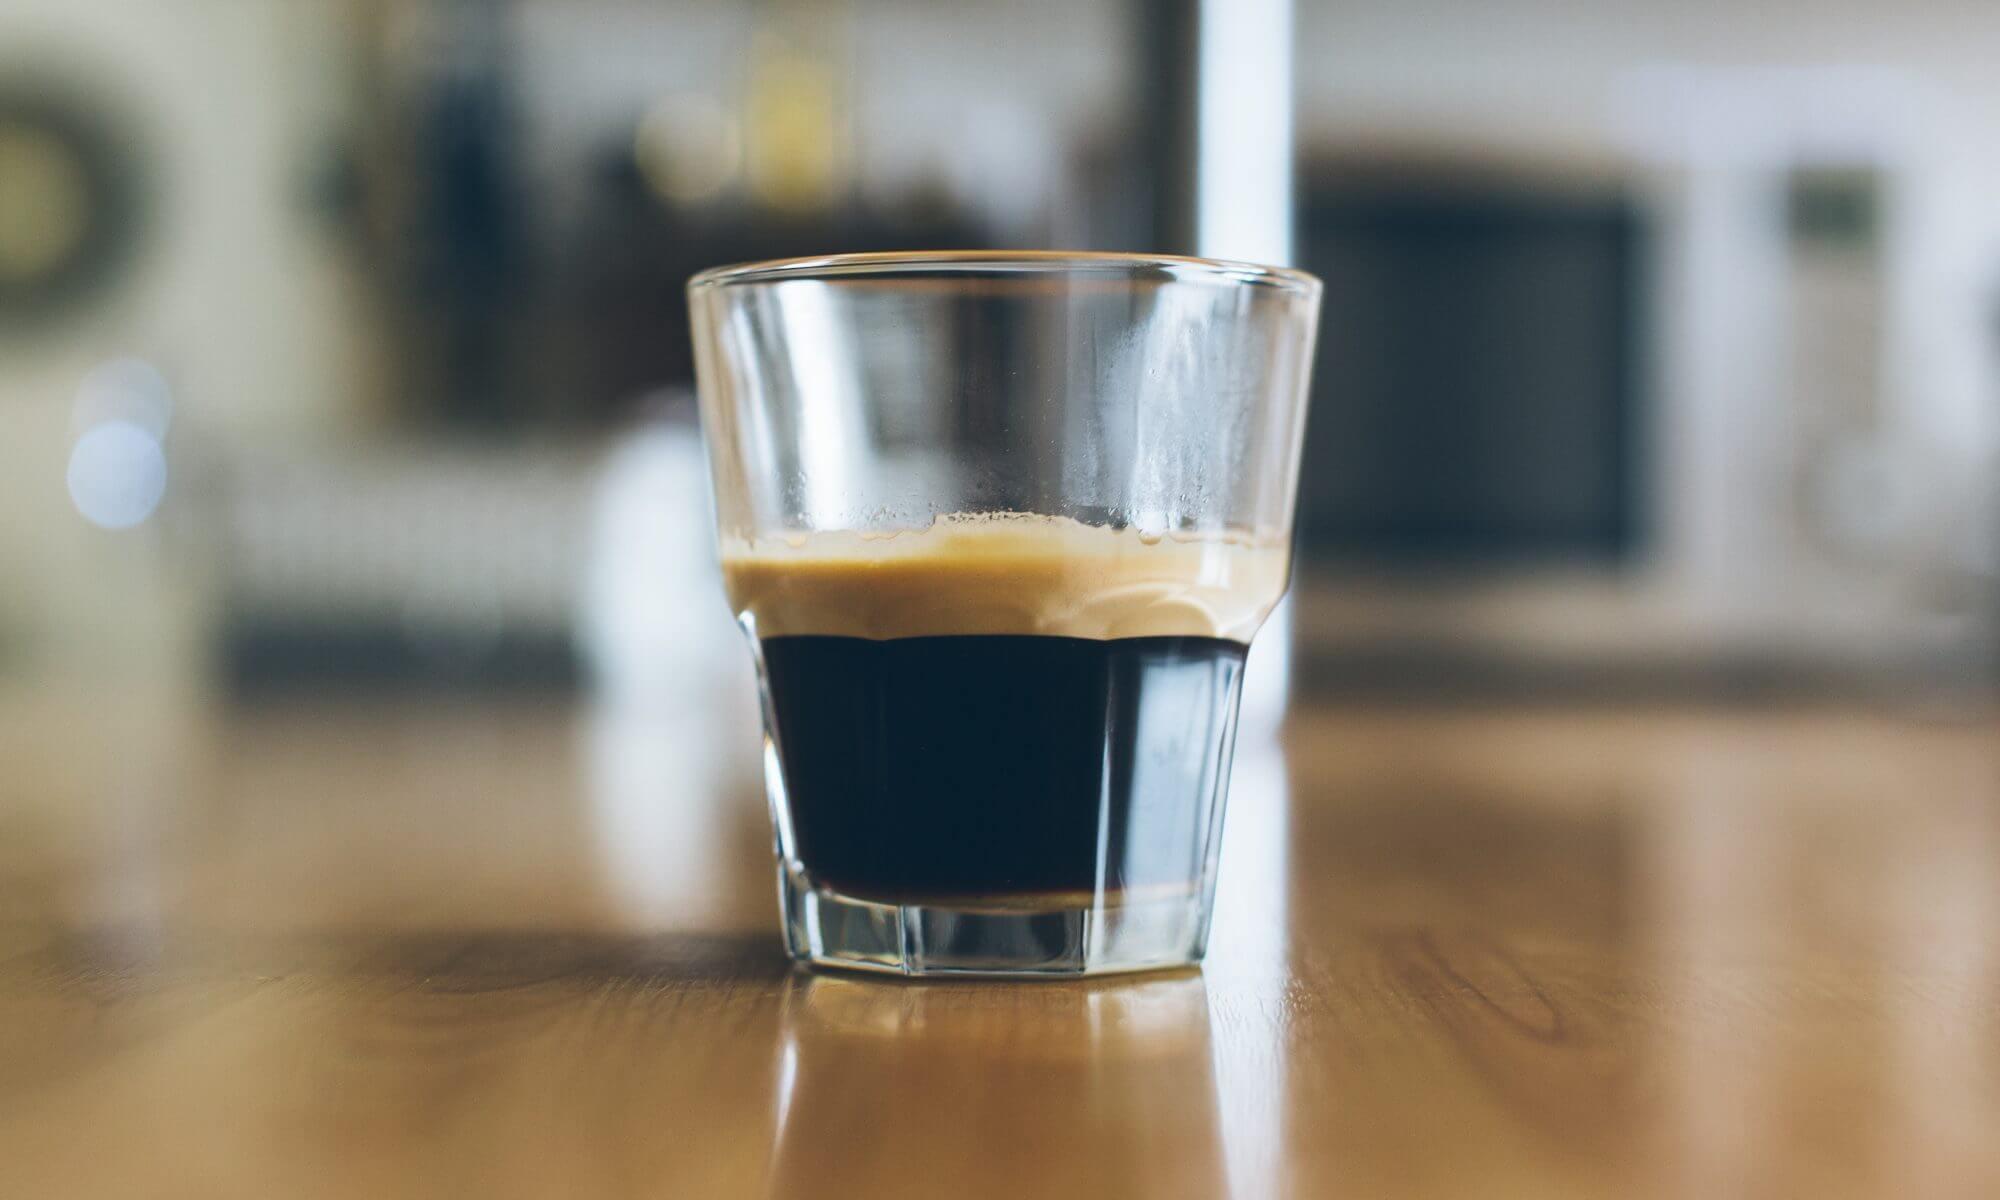 Kaffee-Kapsel-Test im Weltladen